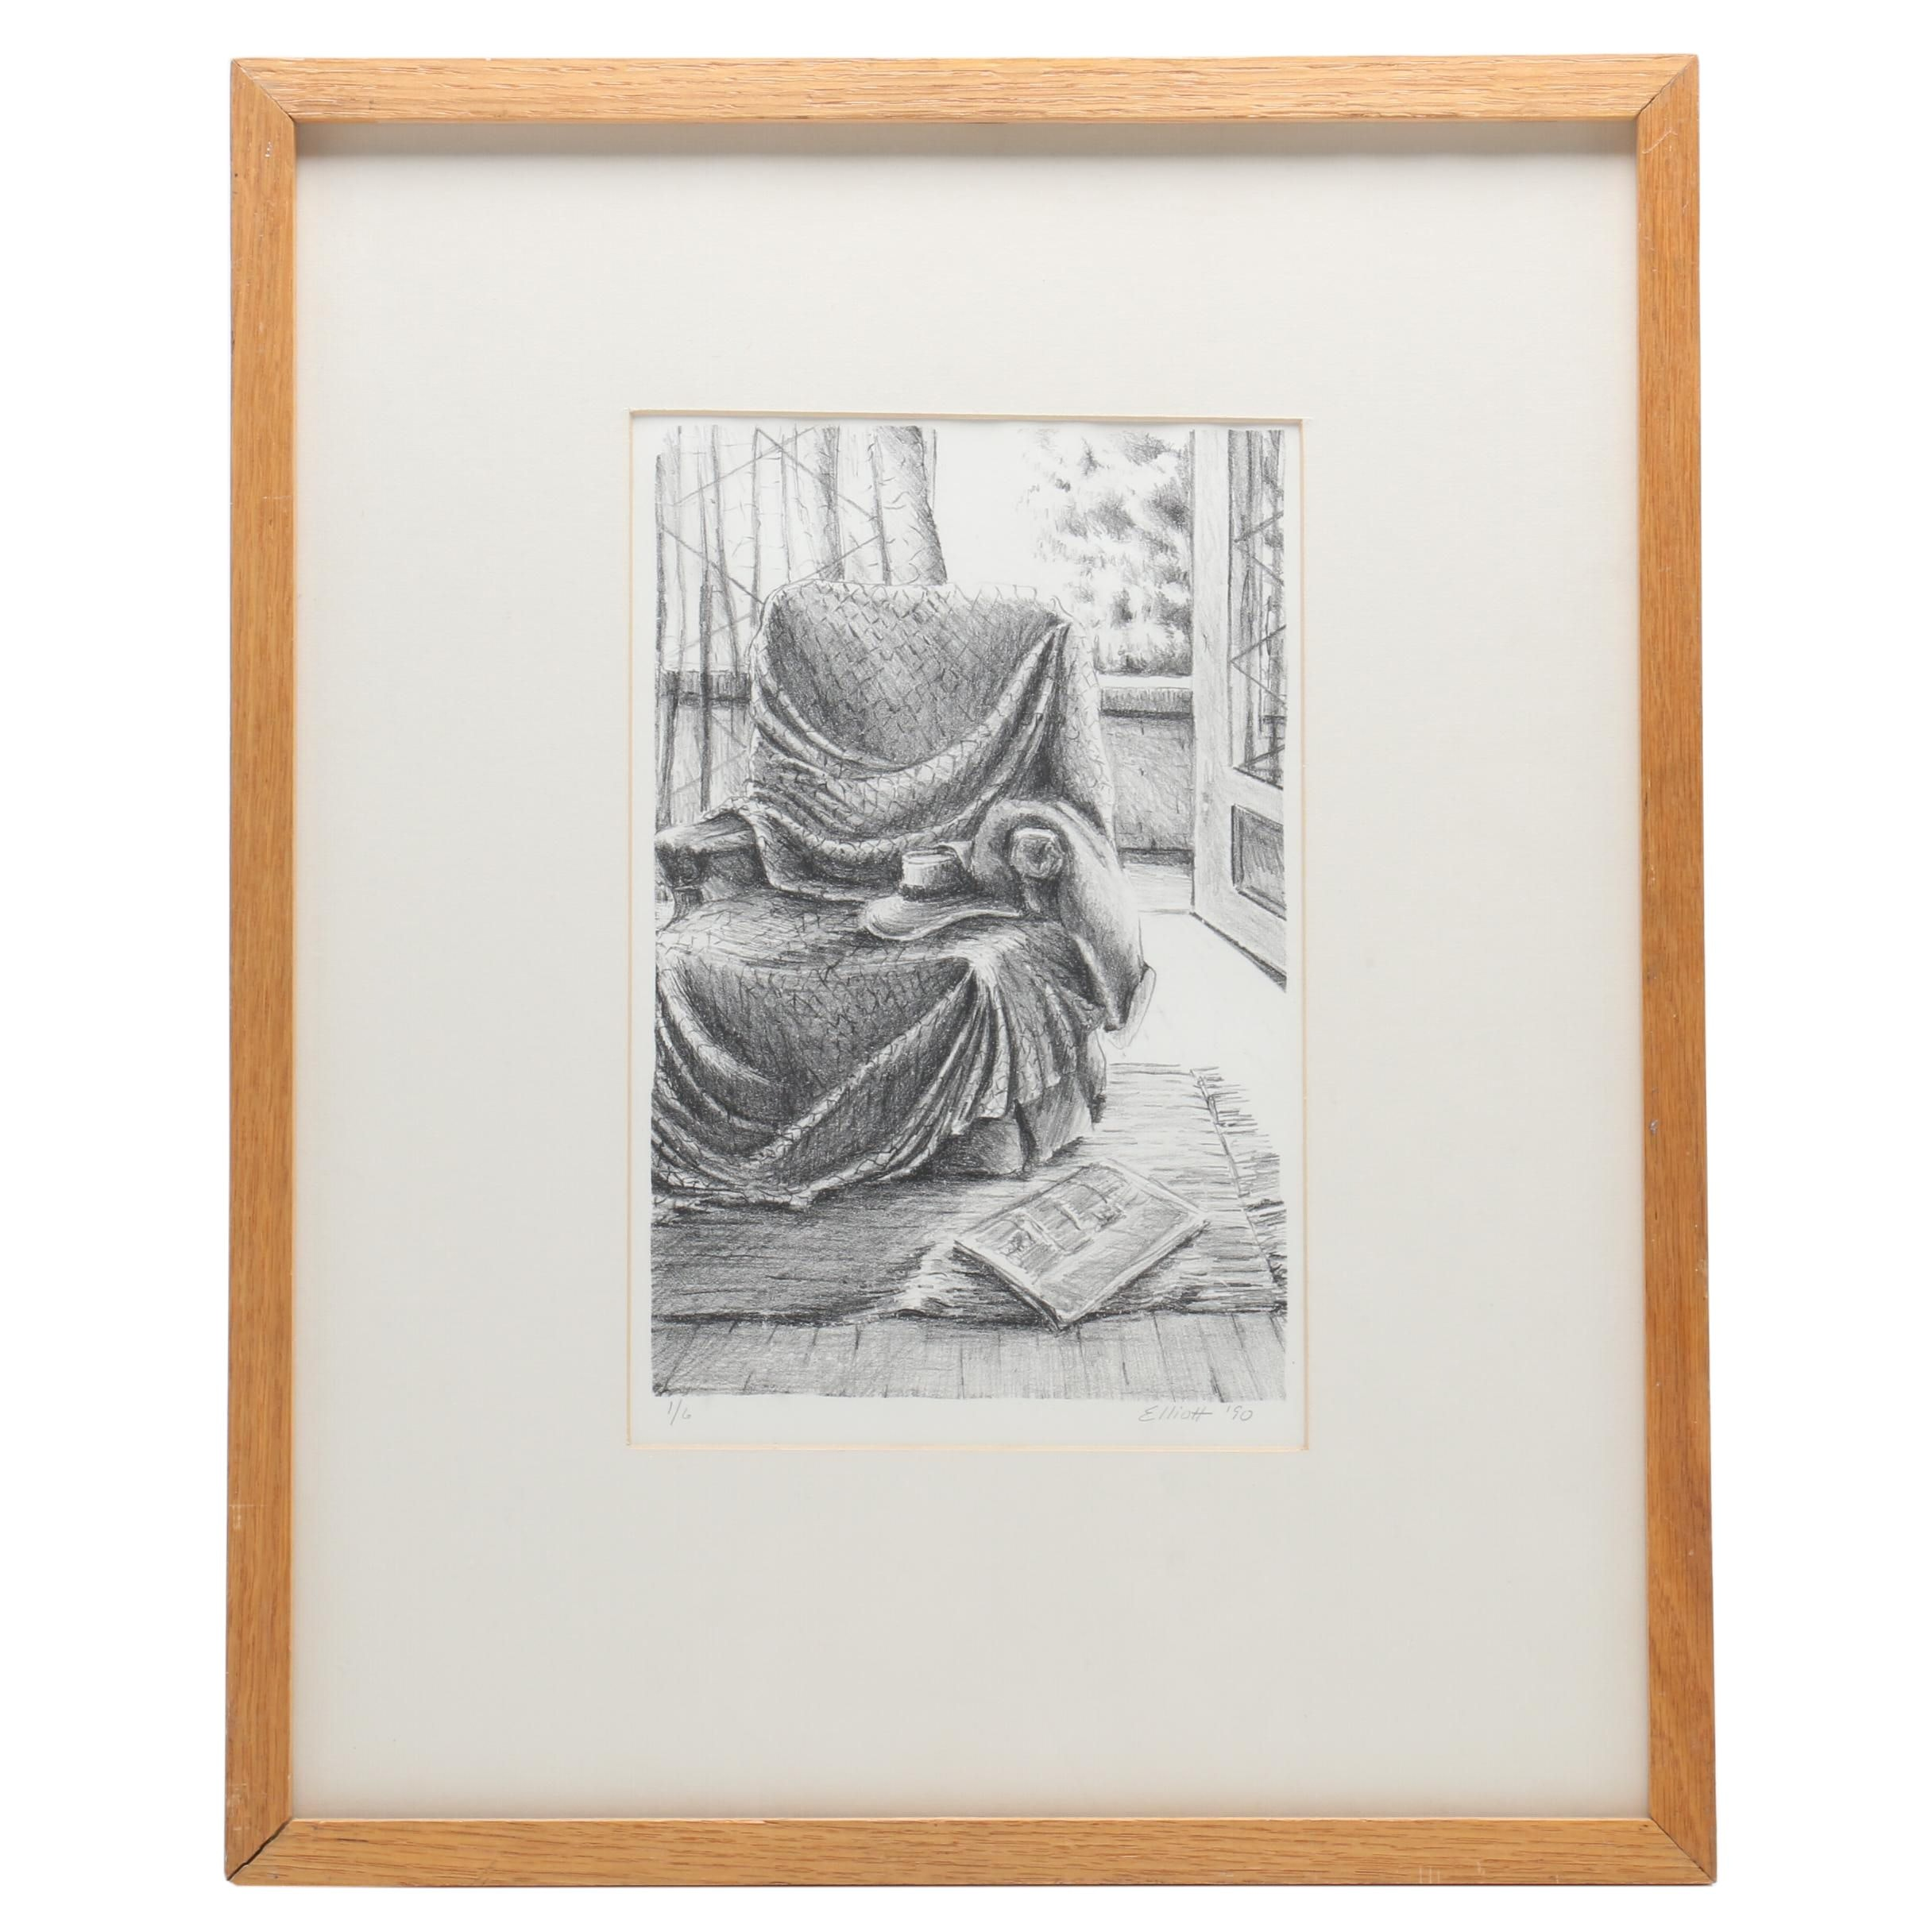 1990 Limited Edition Lithograph of Interior Scene